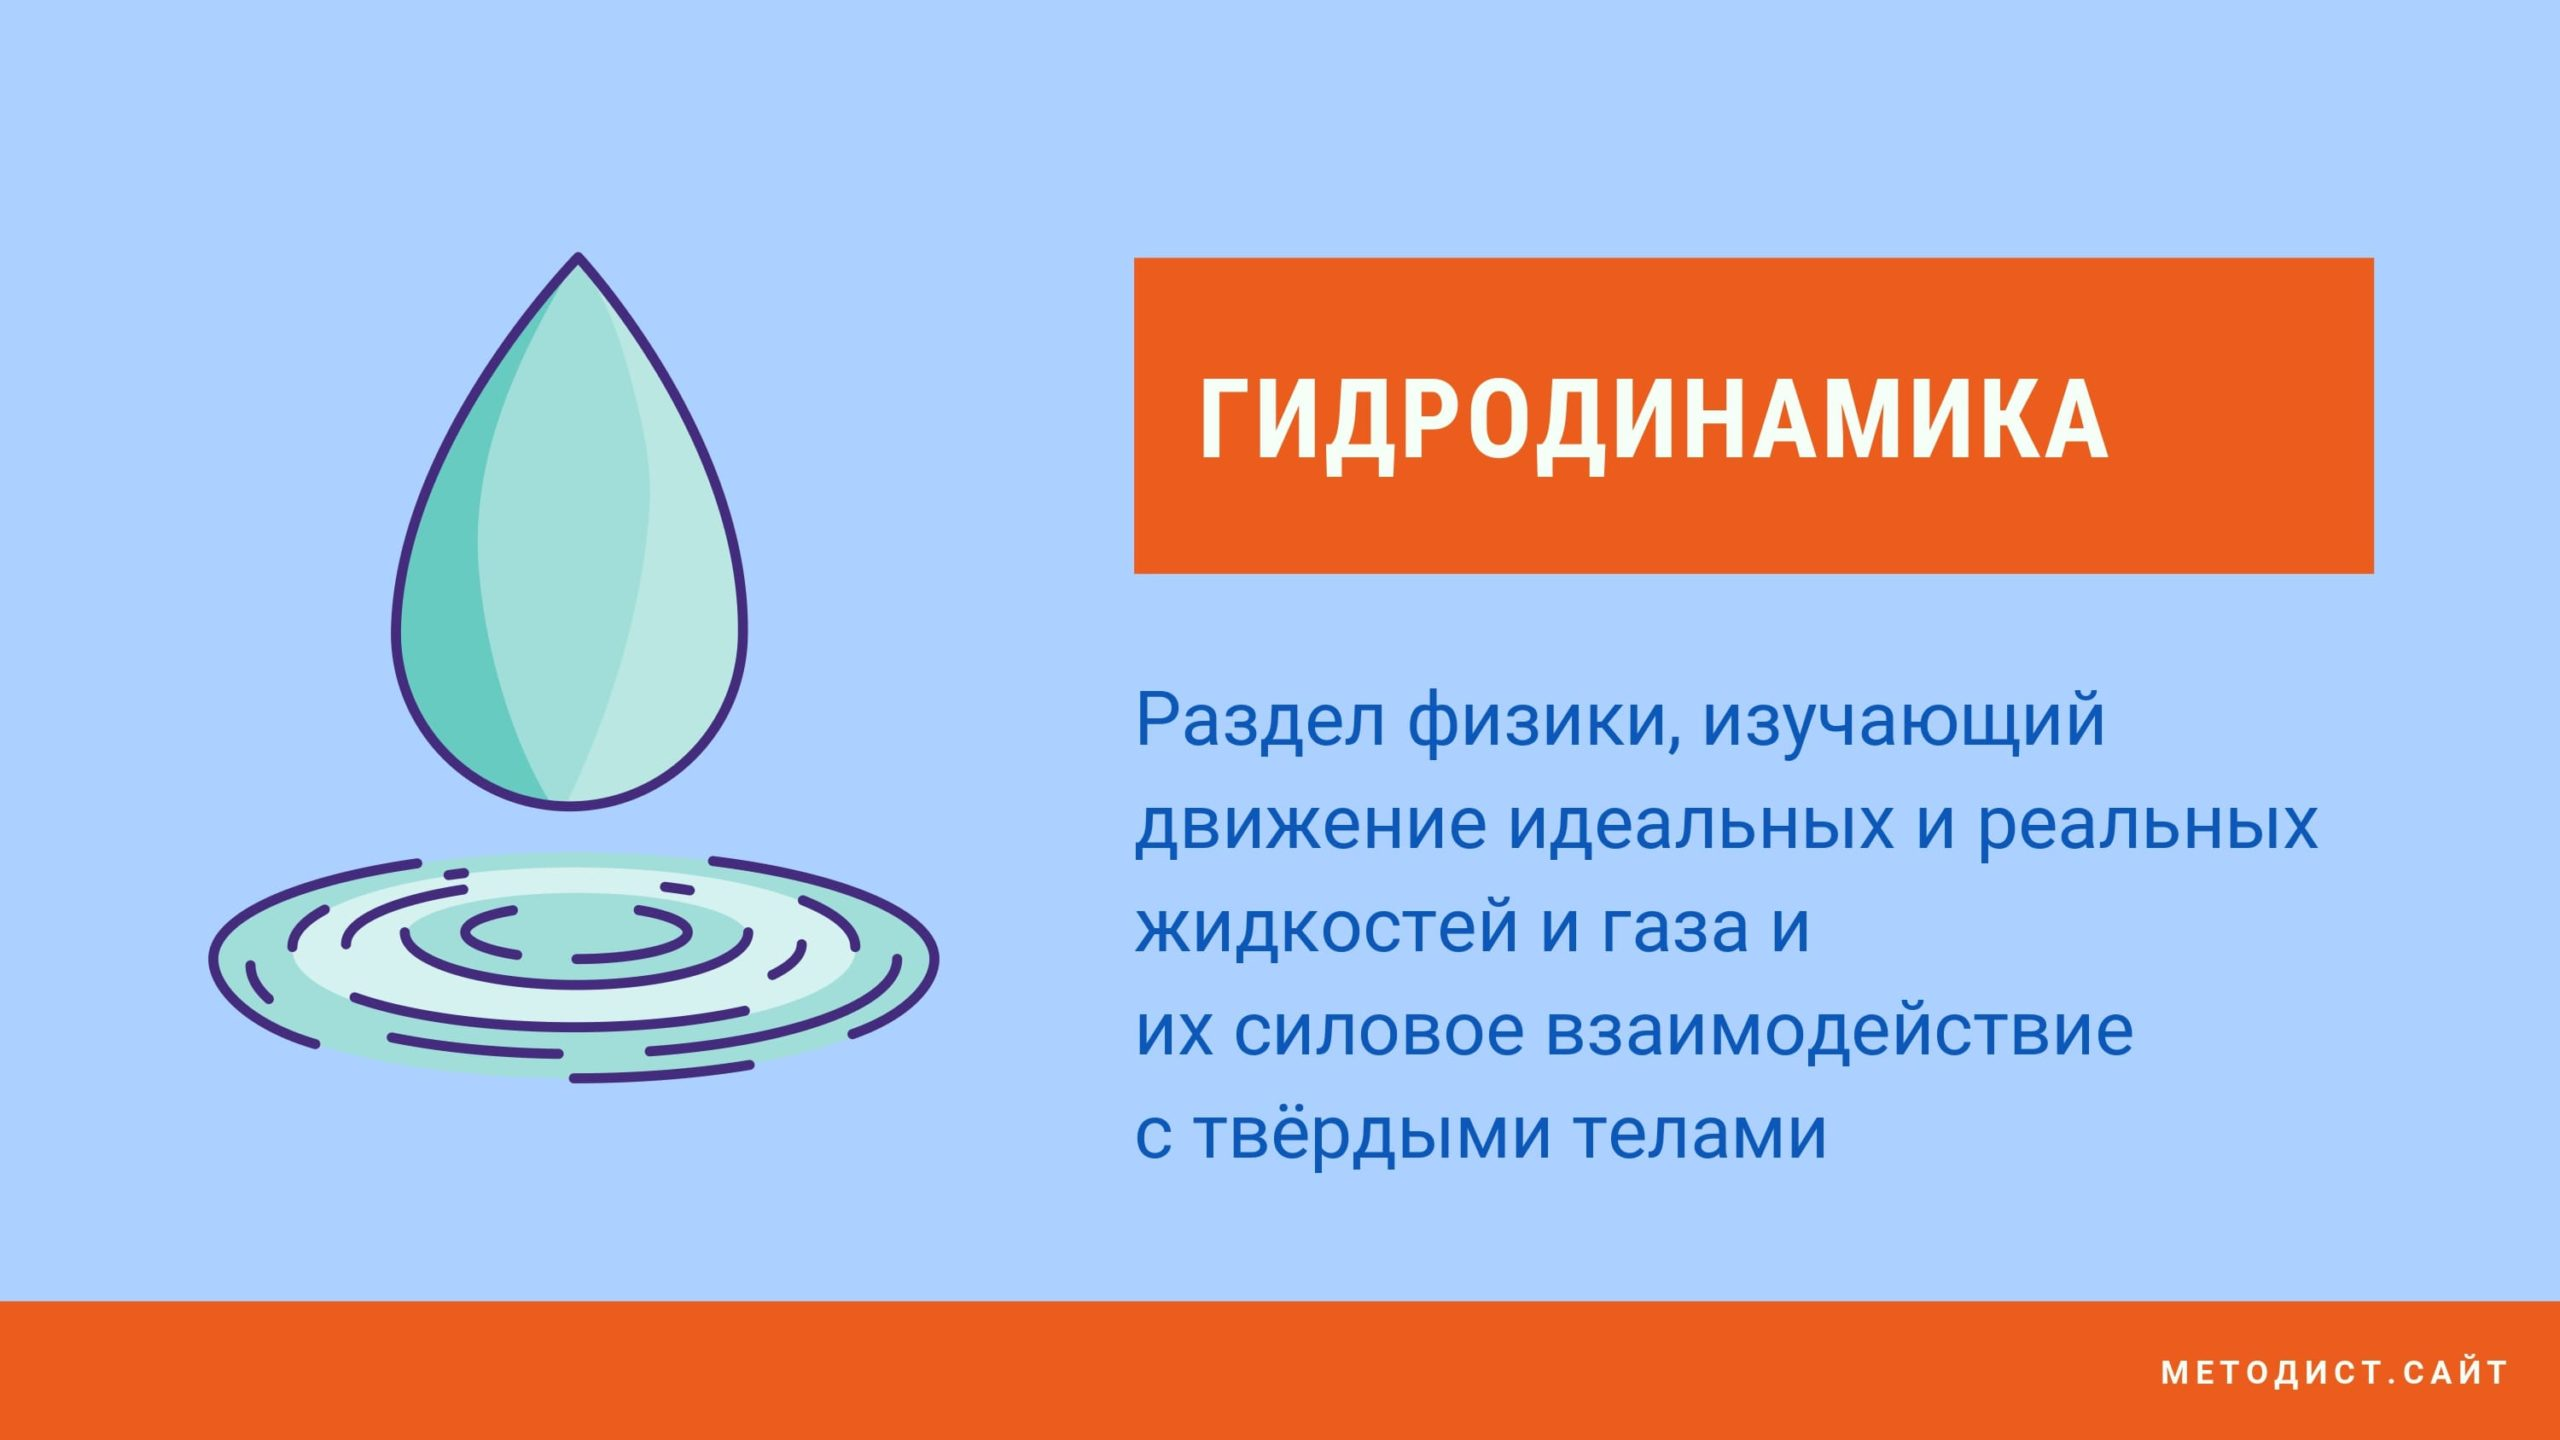 Гидродинамика